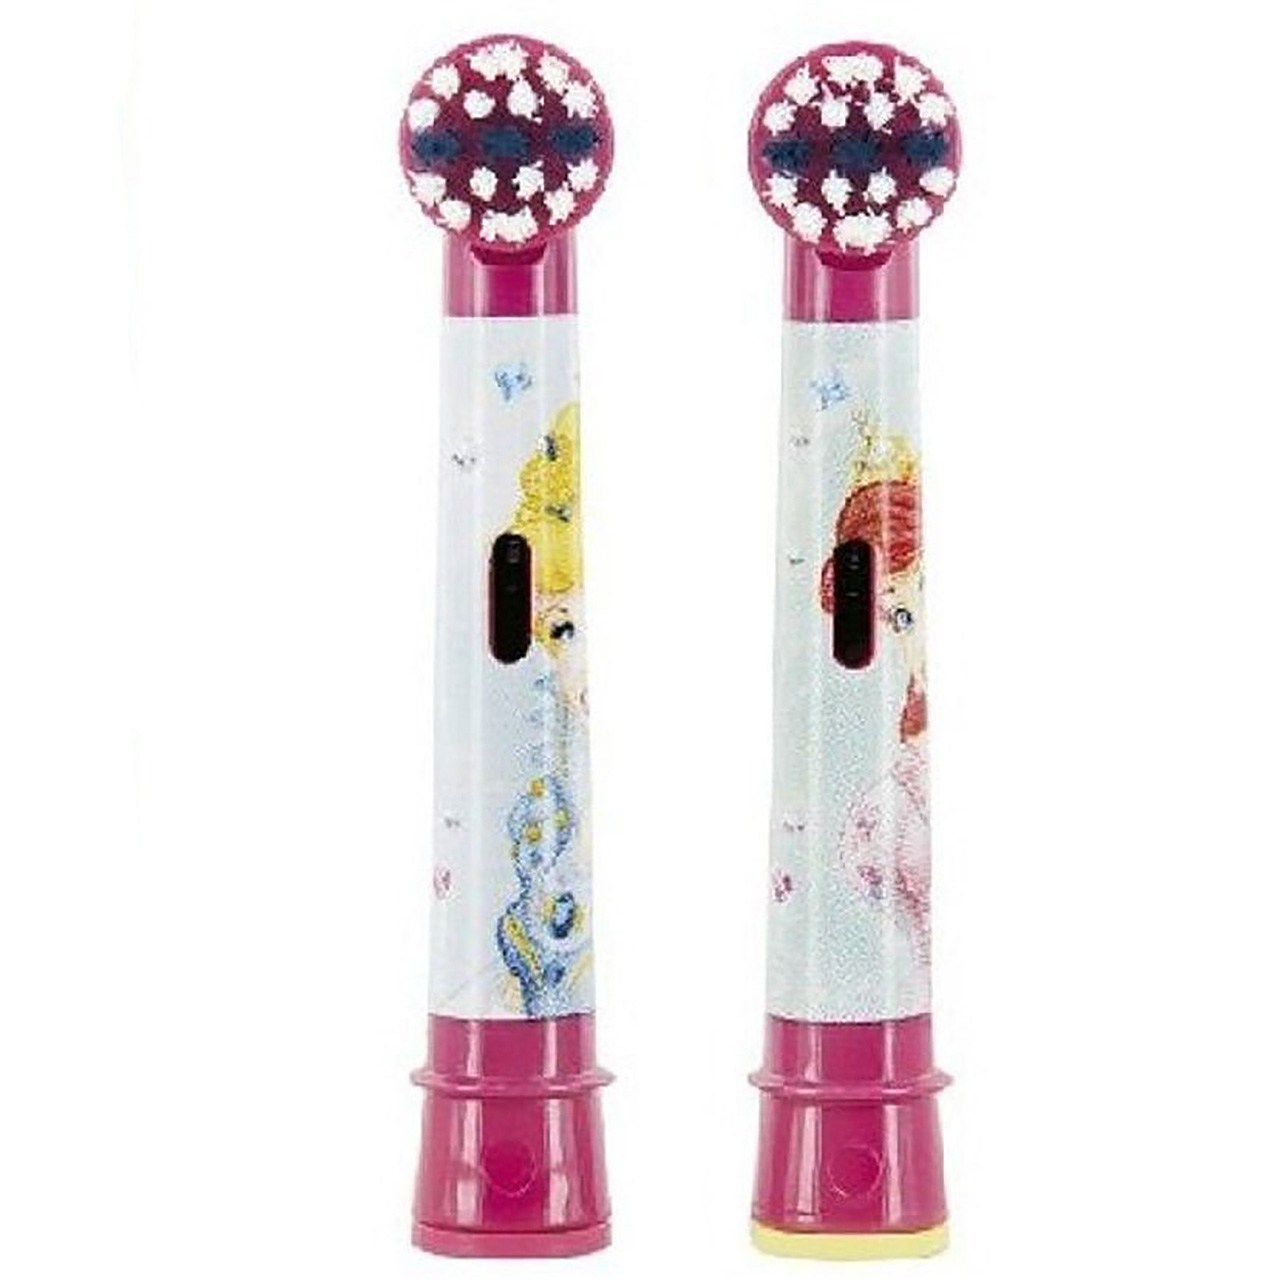 قیمت سری مسواک برقی اورال-بی مدل EB10K مخصوص کودکان طرح دیزنی